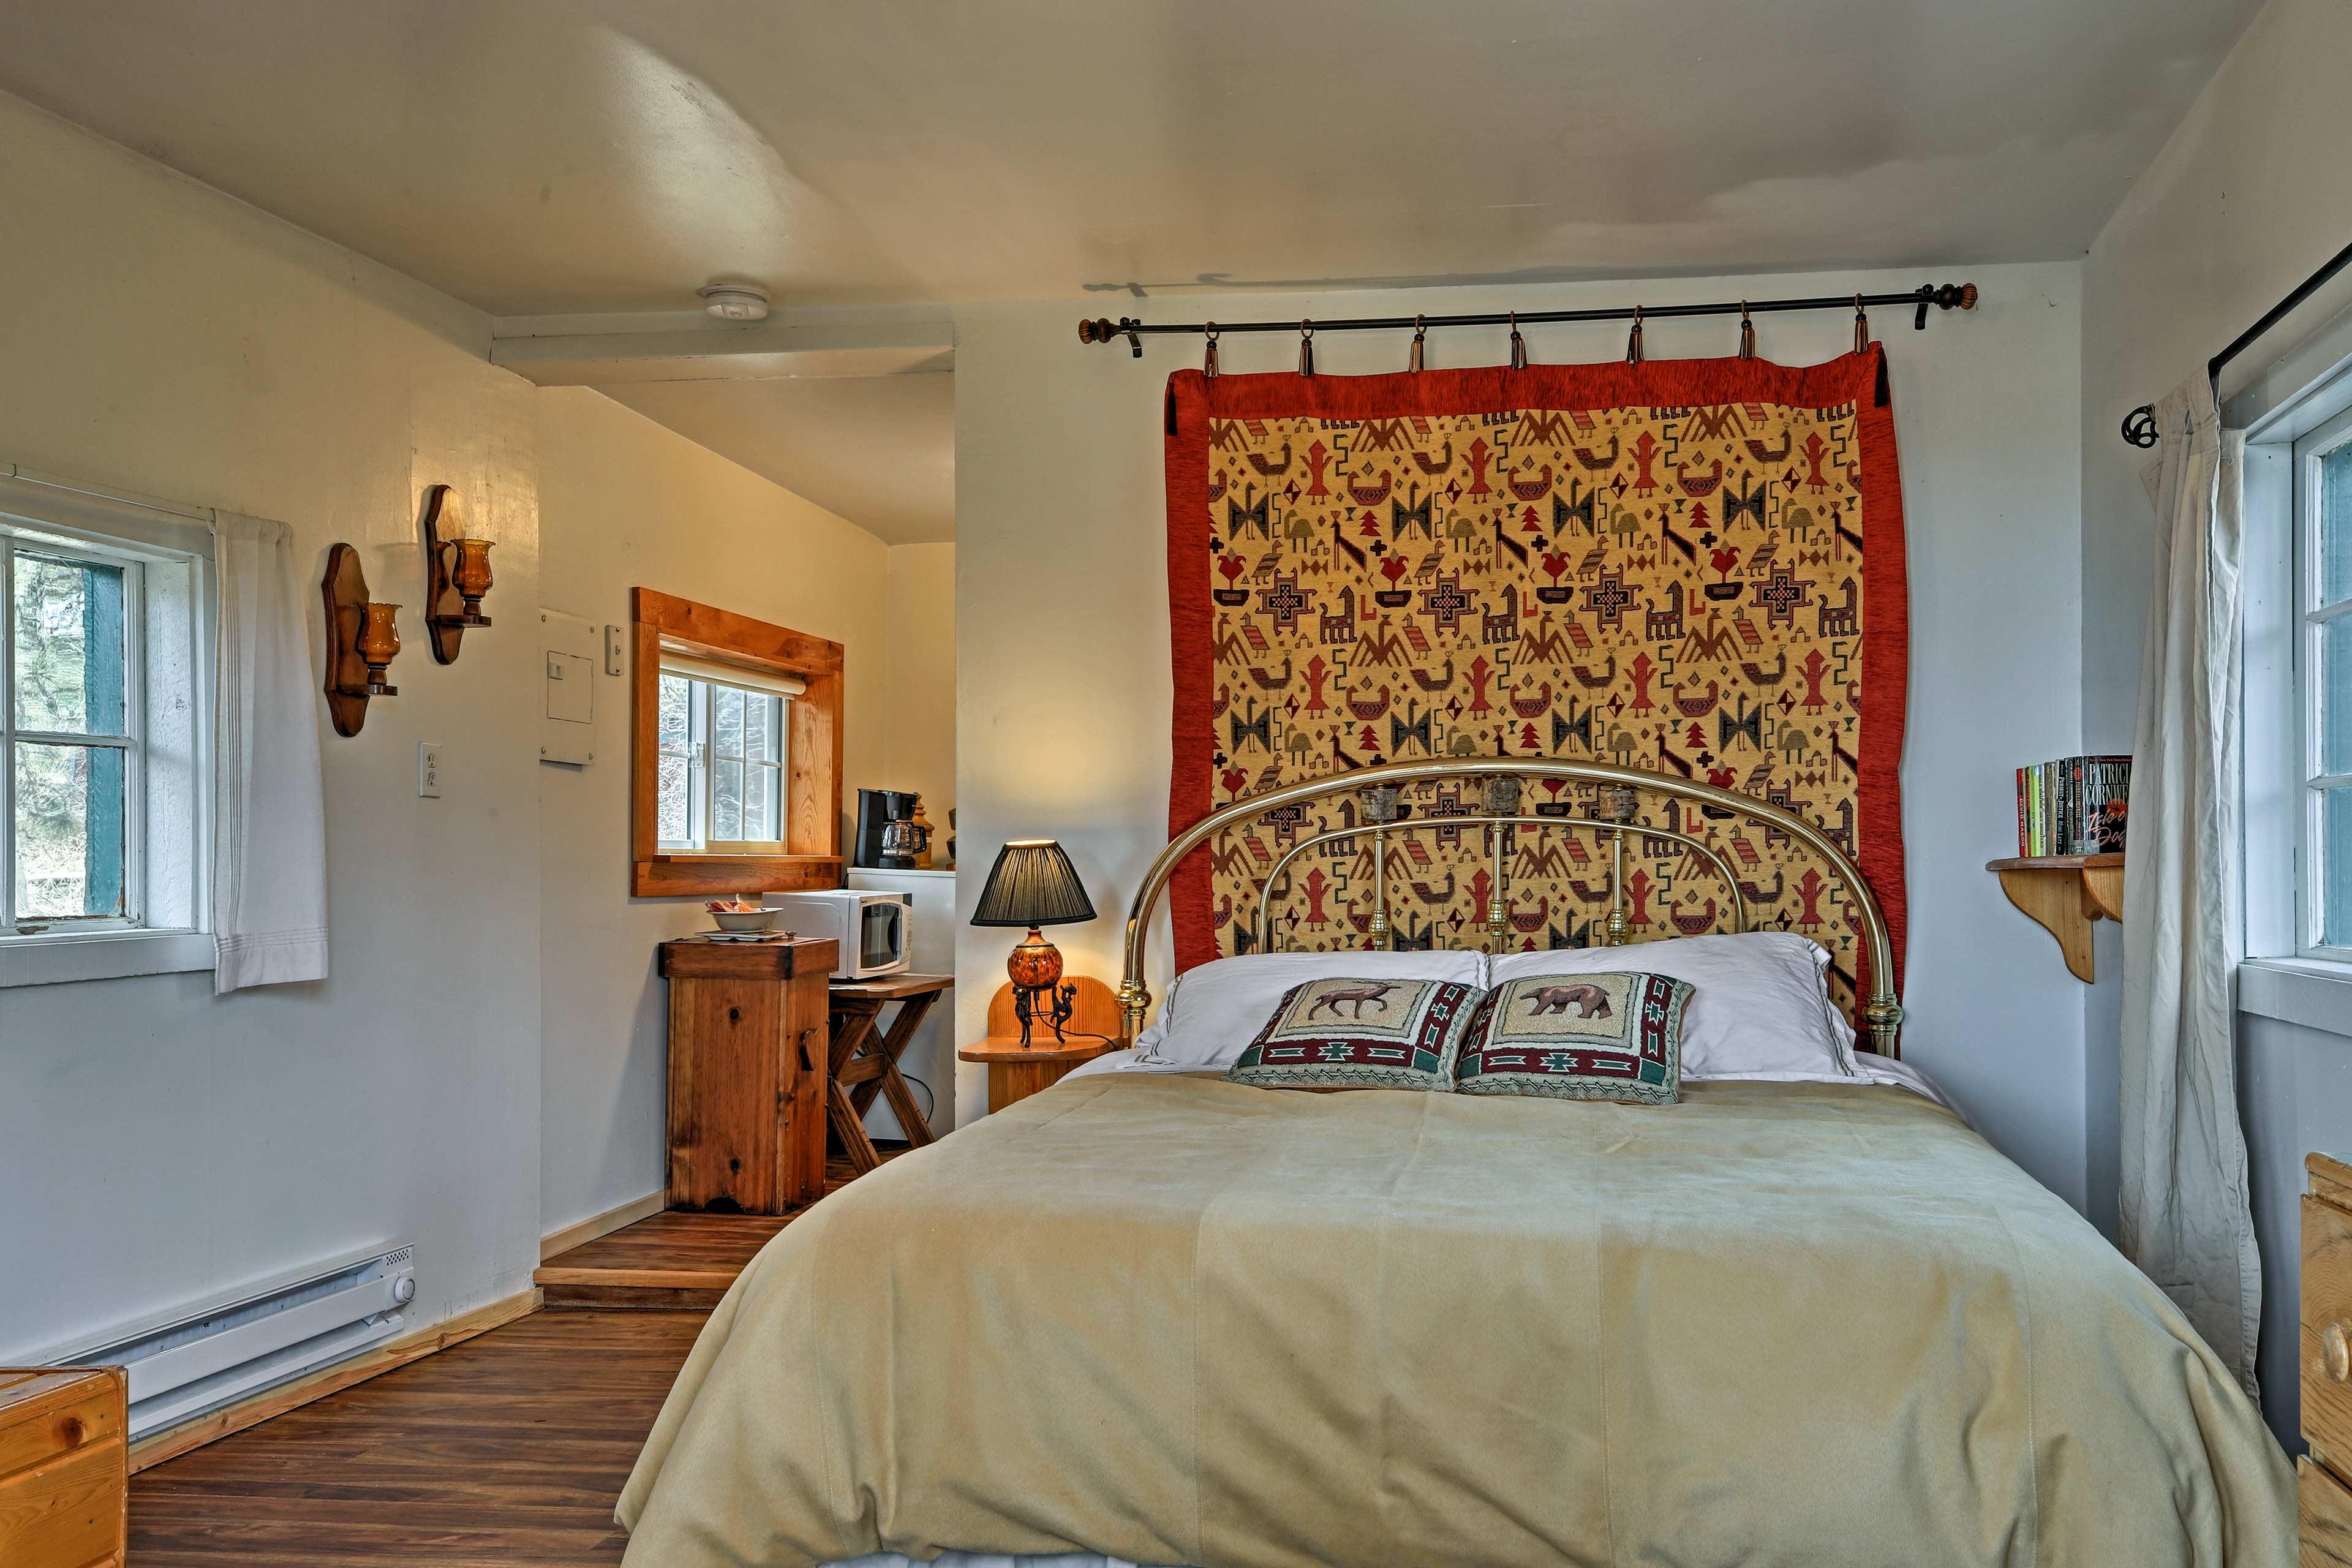 Nature-themed decor creates a rustic cabin feel.